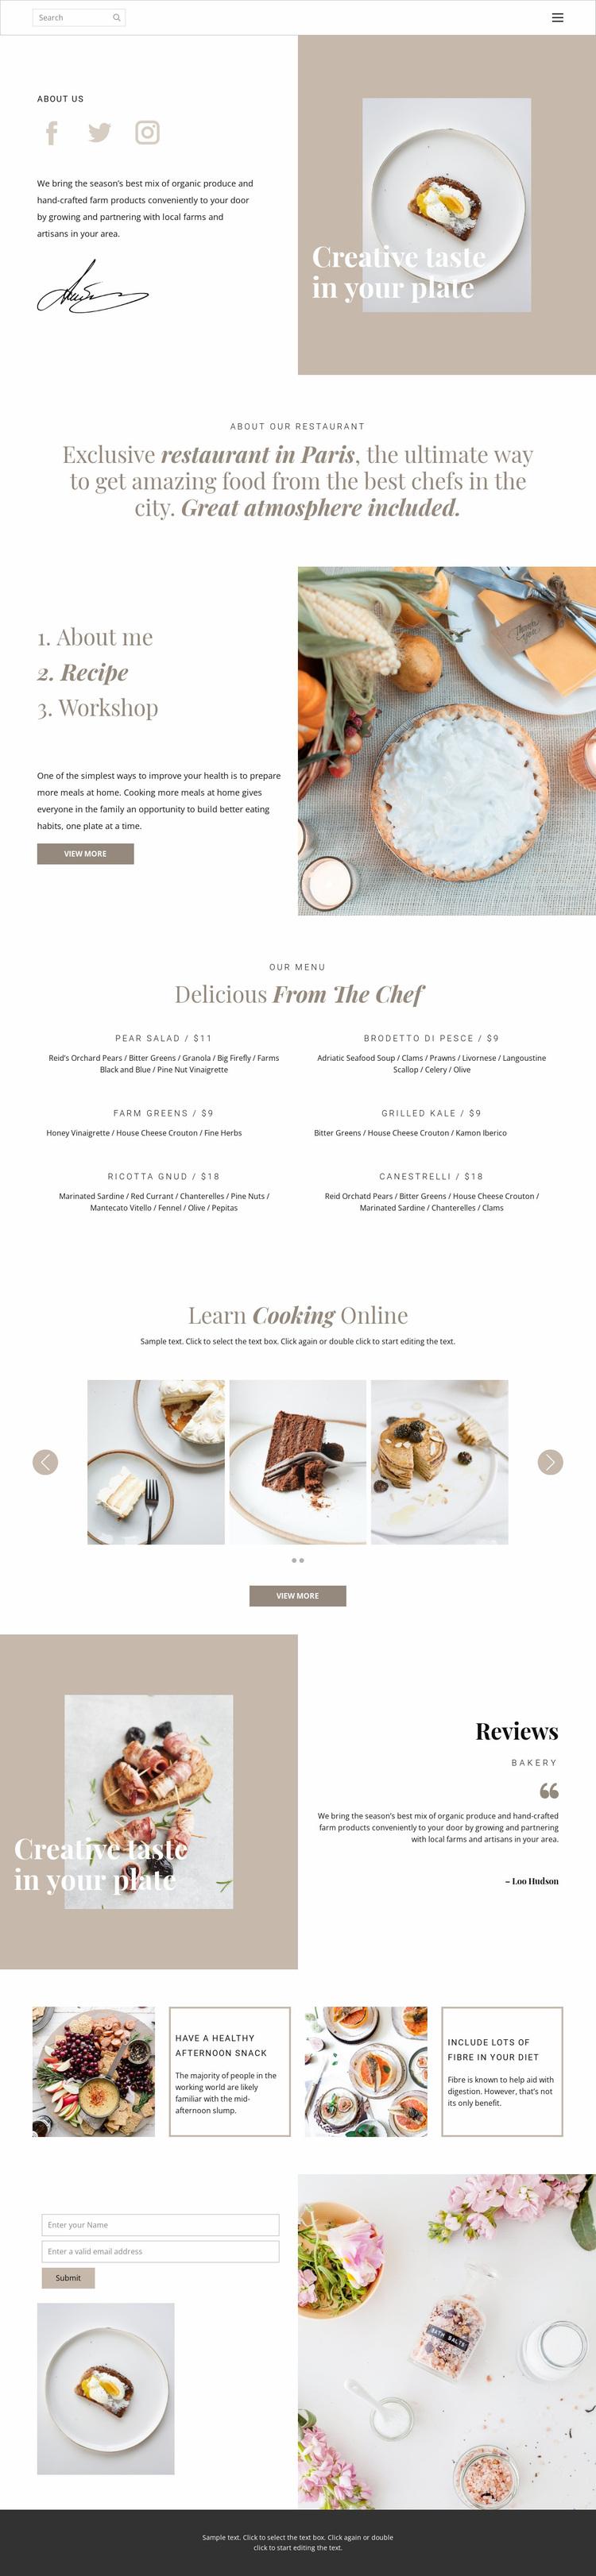 Creative taste in plate Website Design